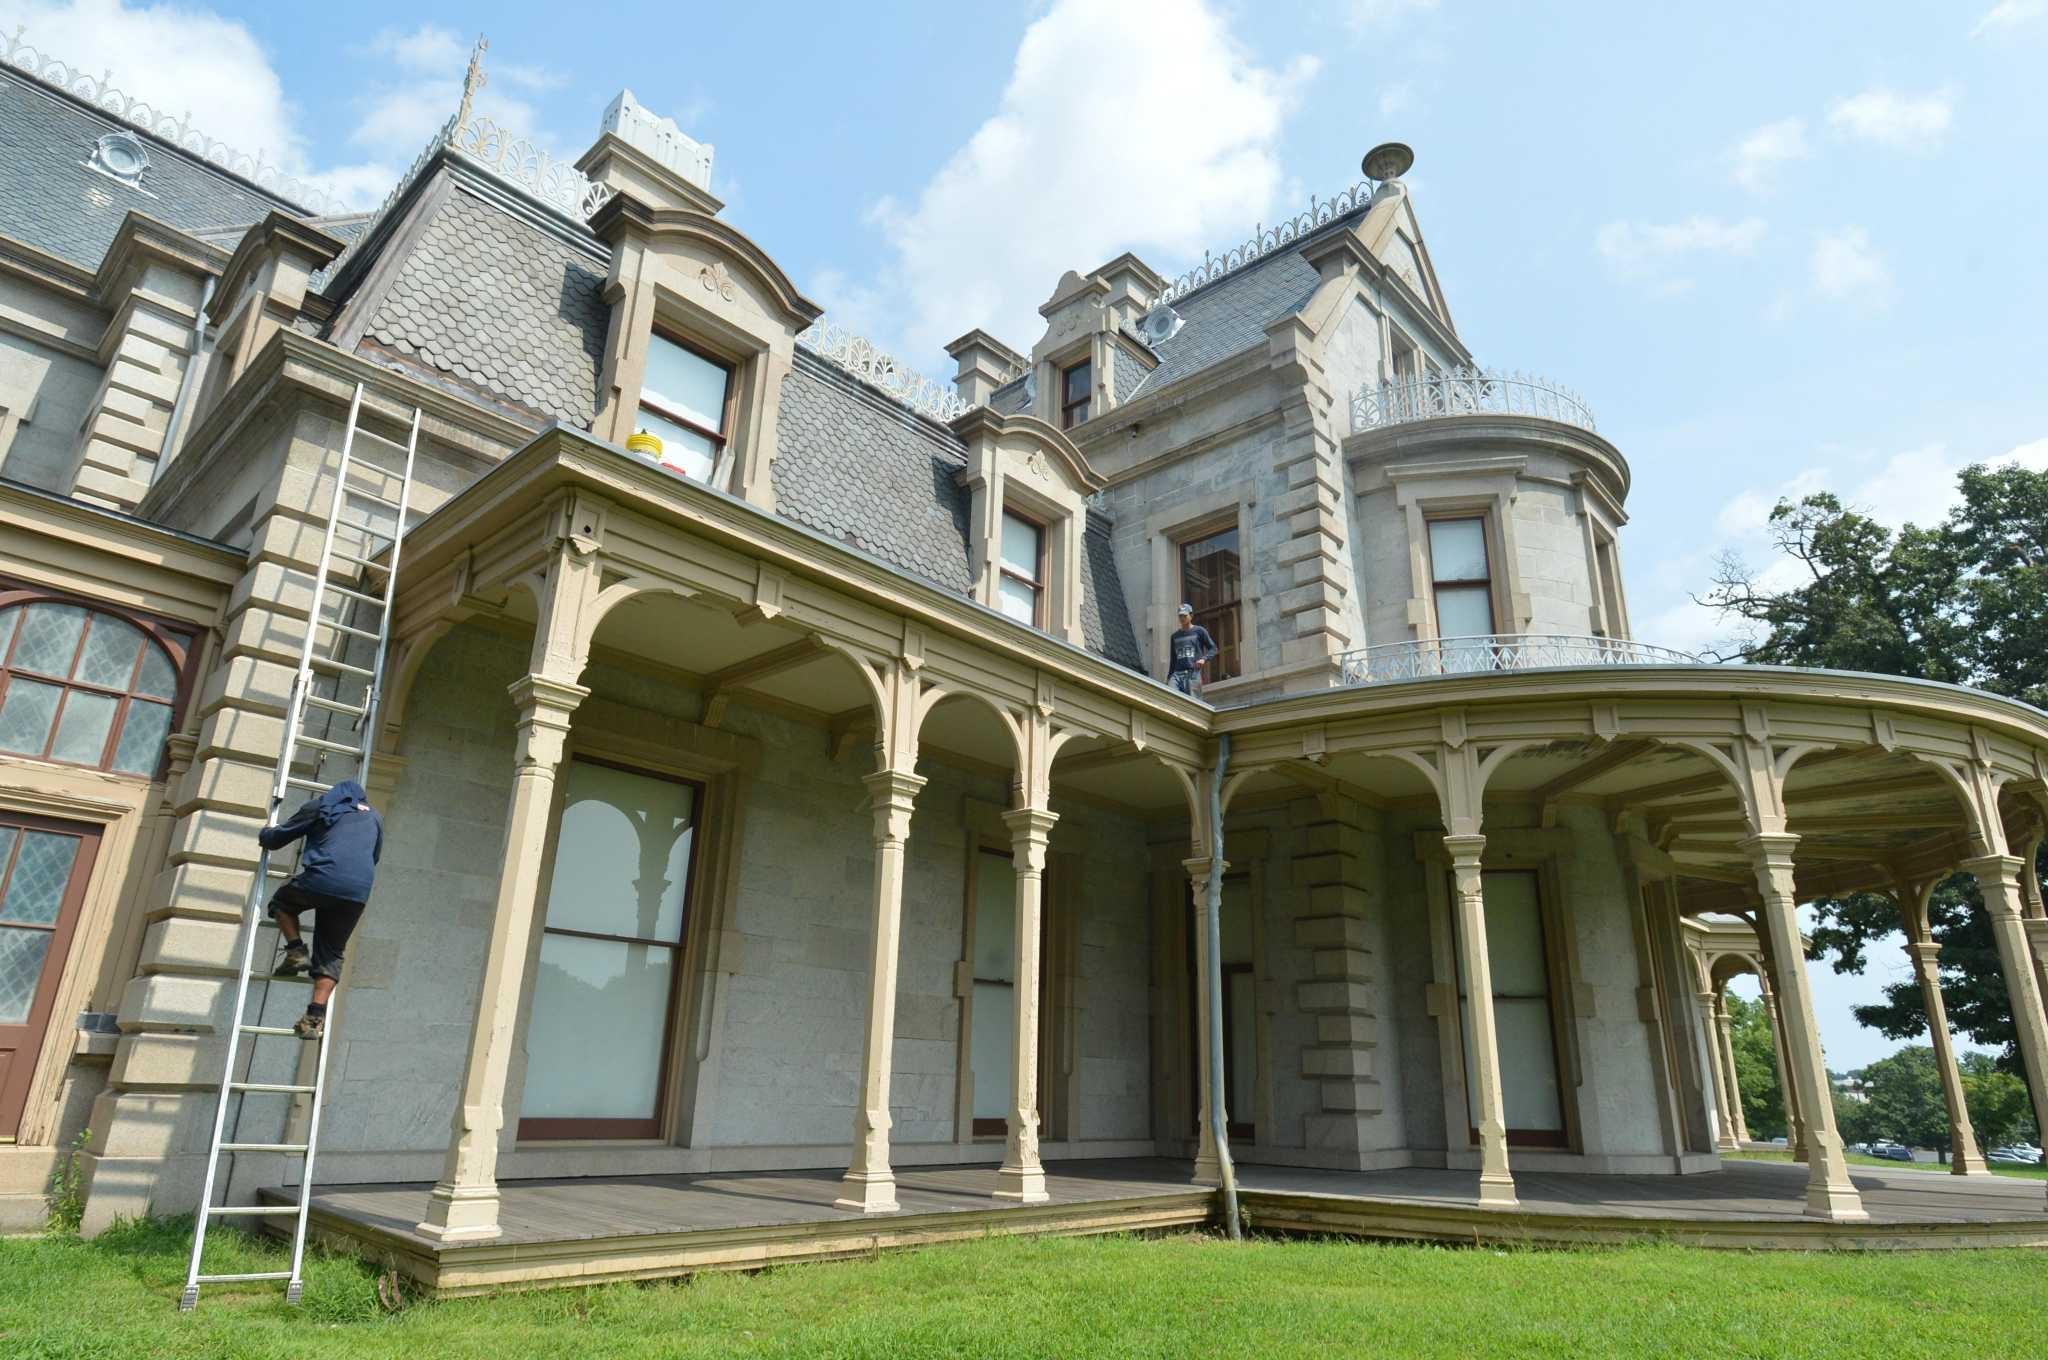 Norwalk's Lockwood mansion to be set of Netflix film